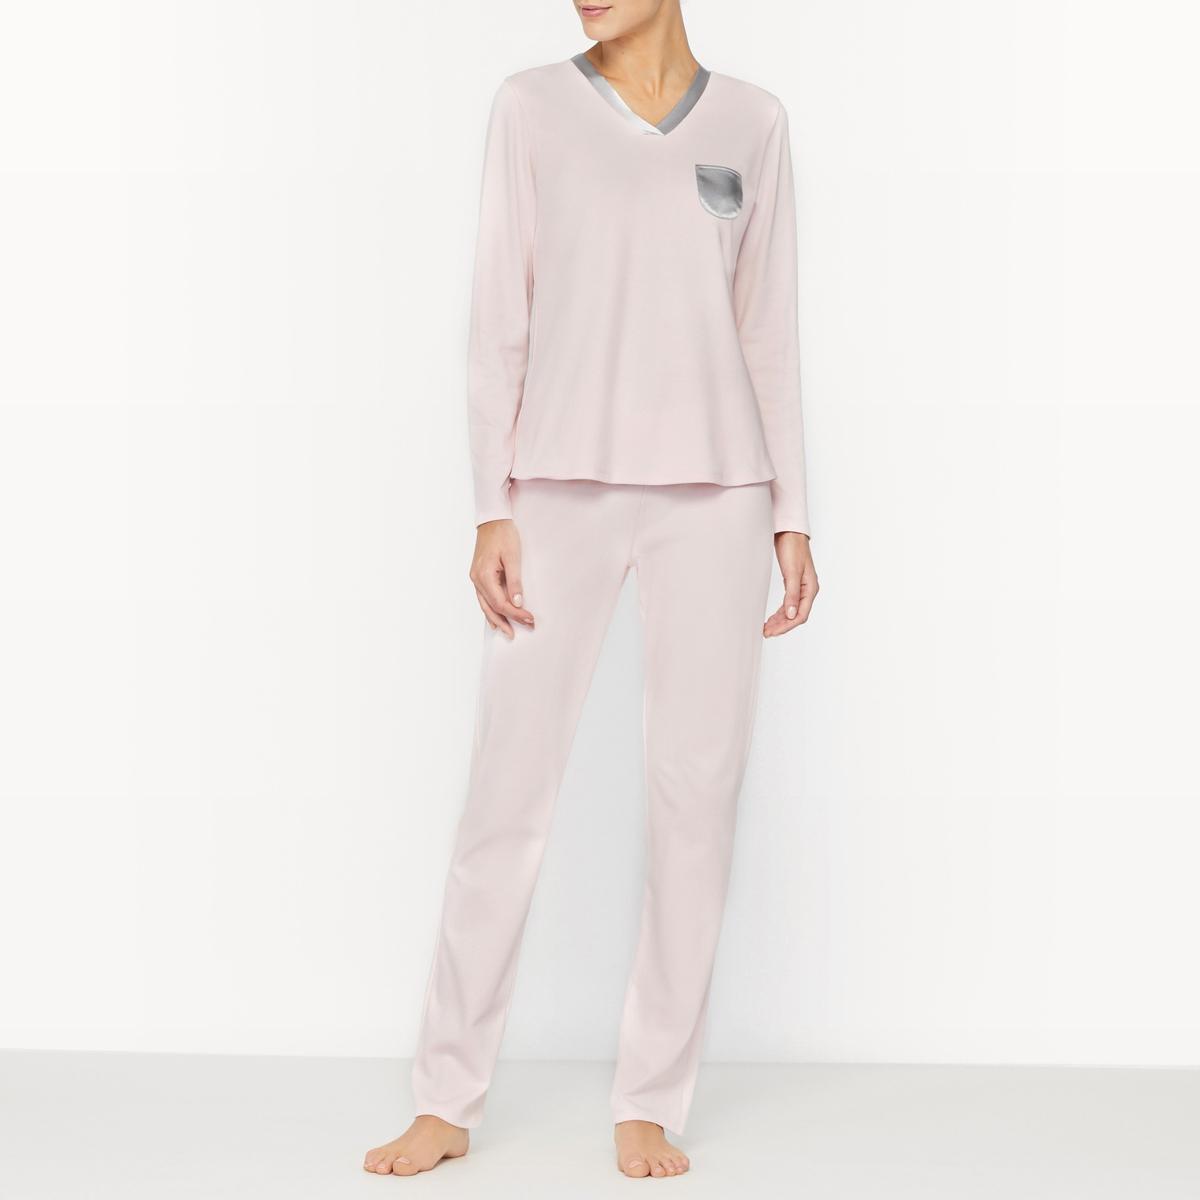 Пижама Olympe пижама quelle le jogger 262528